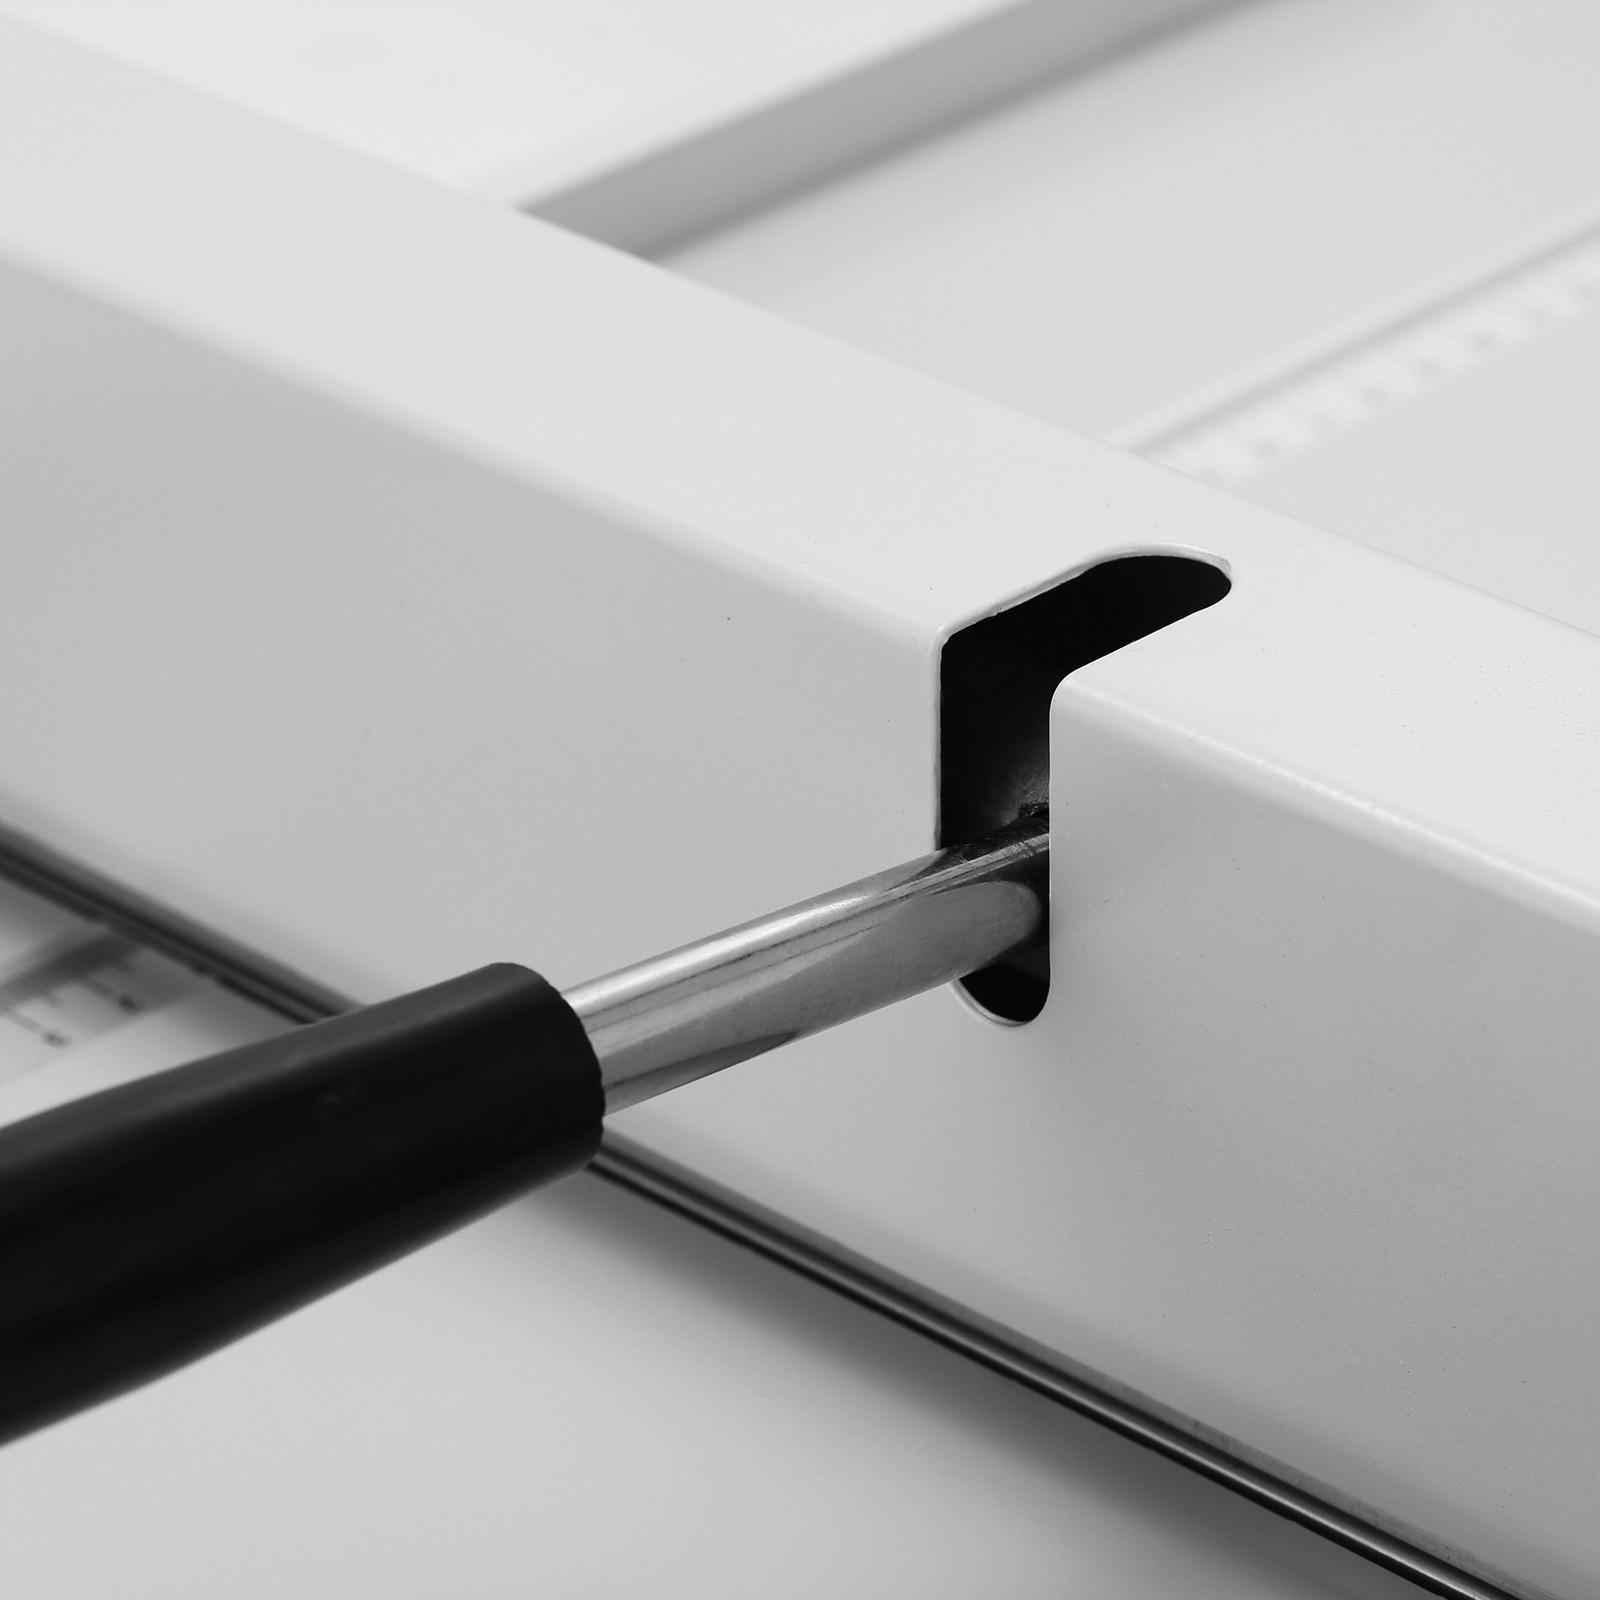 Cordonatrice-Perforatrice-Max-350-520mm-Profondita-Regolabile-Elettrica-Manuale miniatura 44